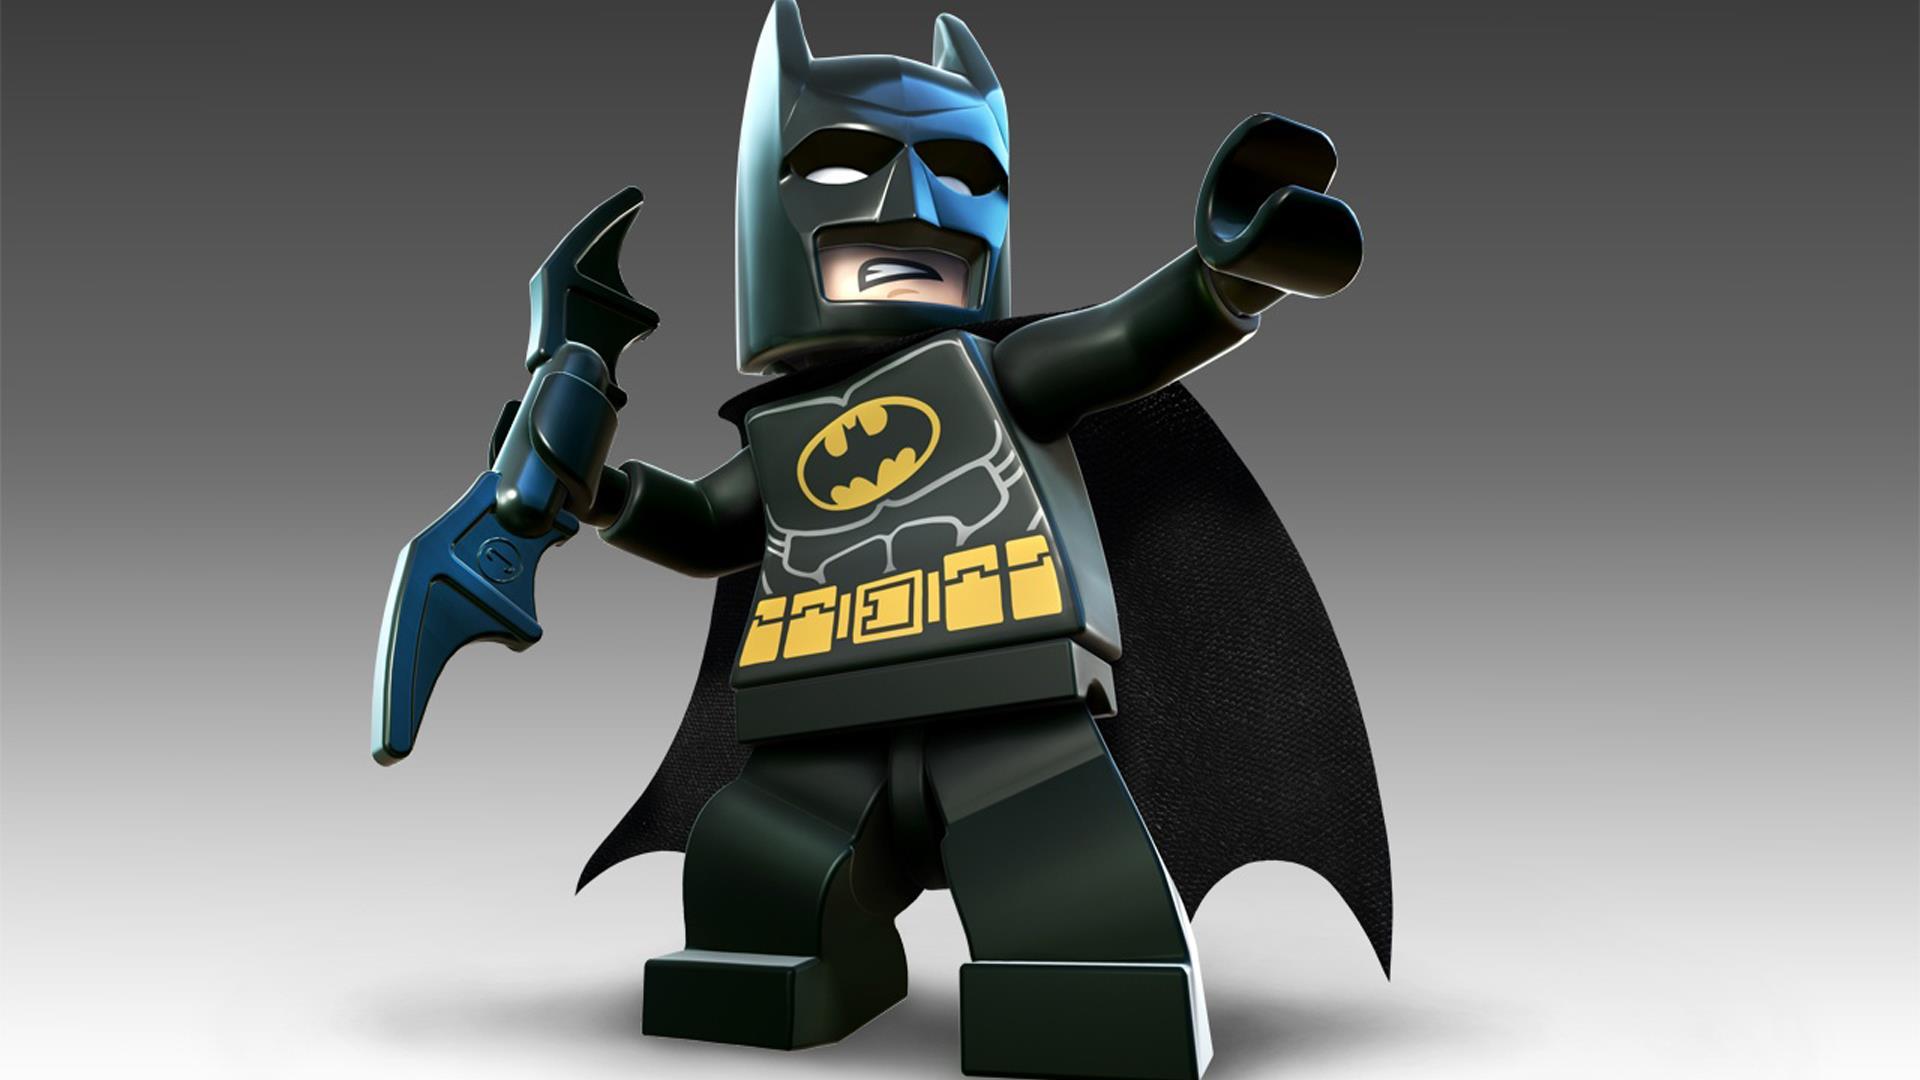 Lego Batman 2 Dc Super Heroes Wallpapers Pictures Images